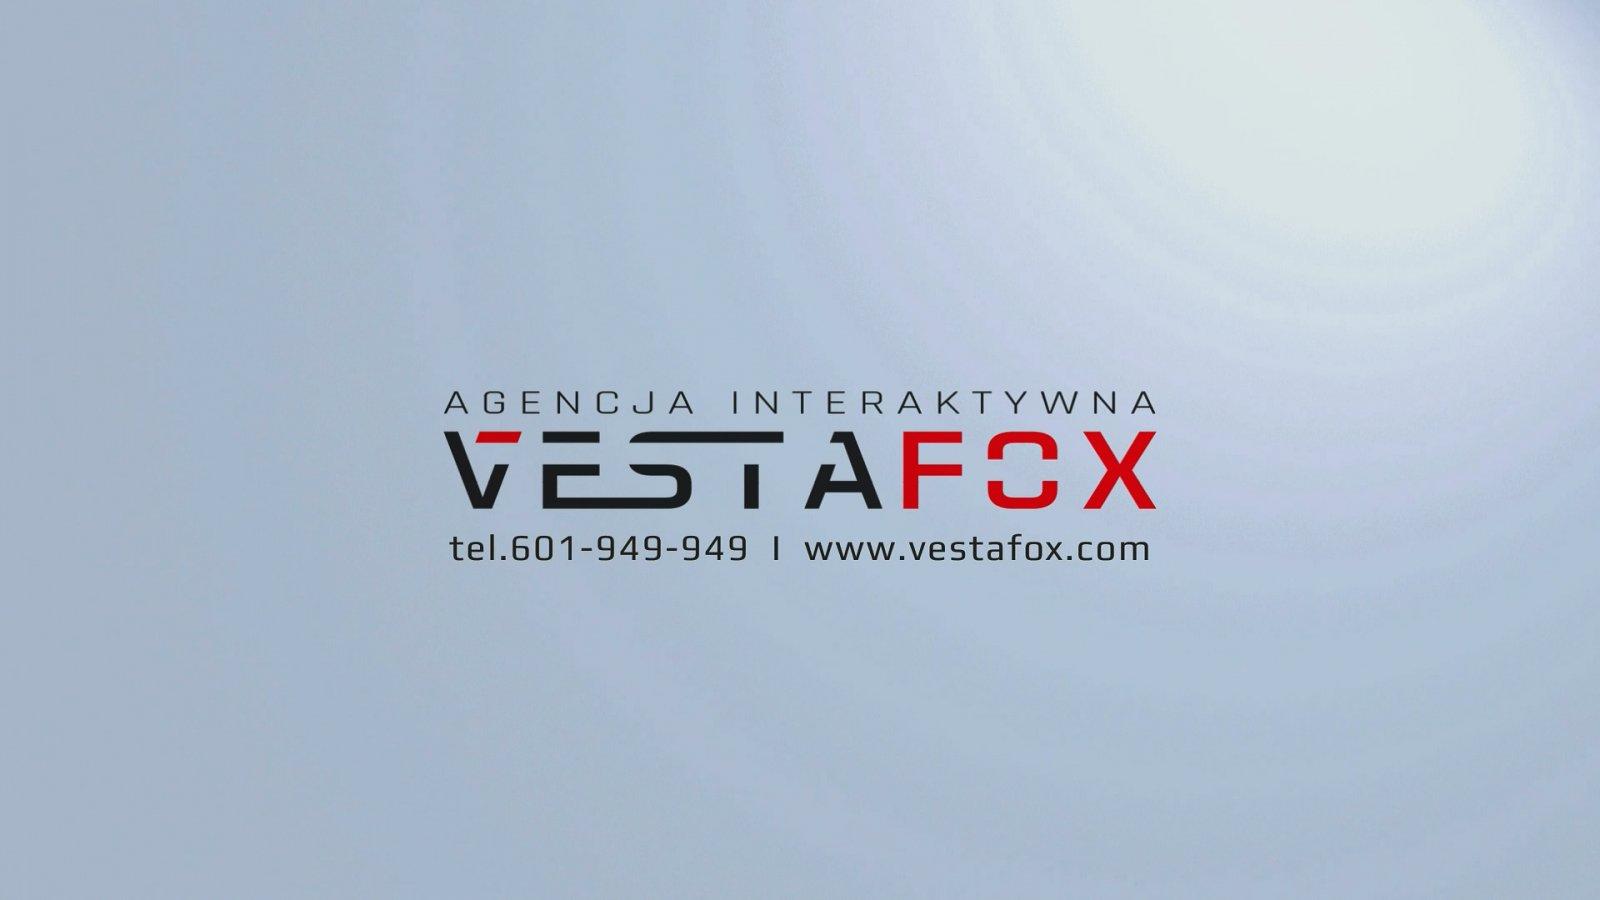 VestaFox - Spot Oferta